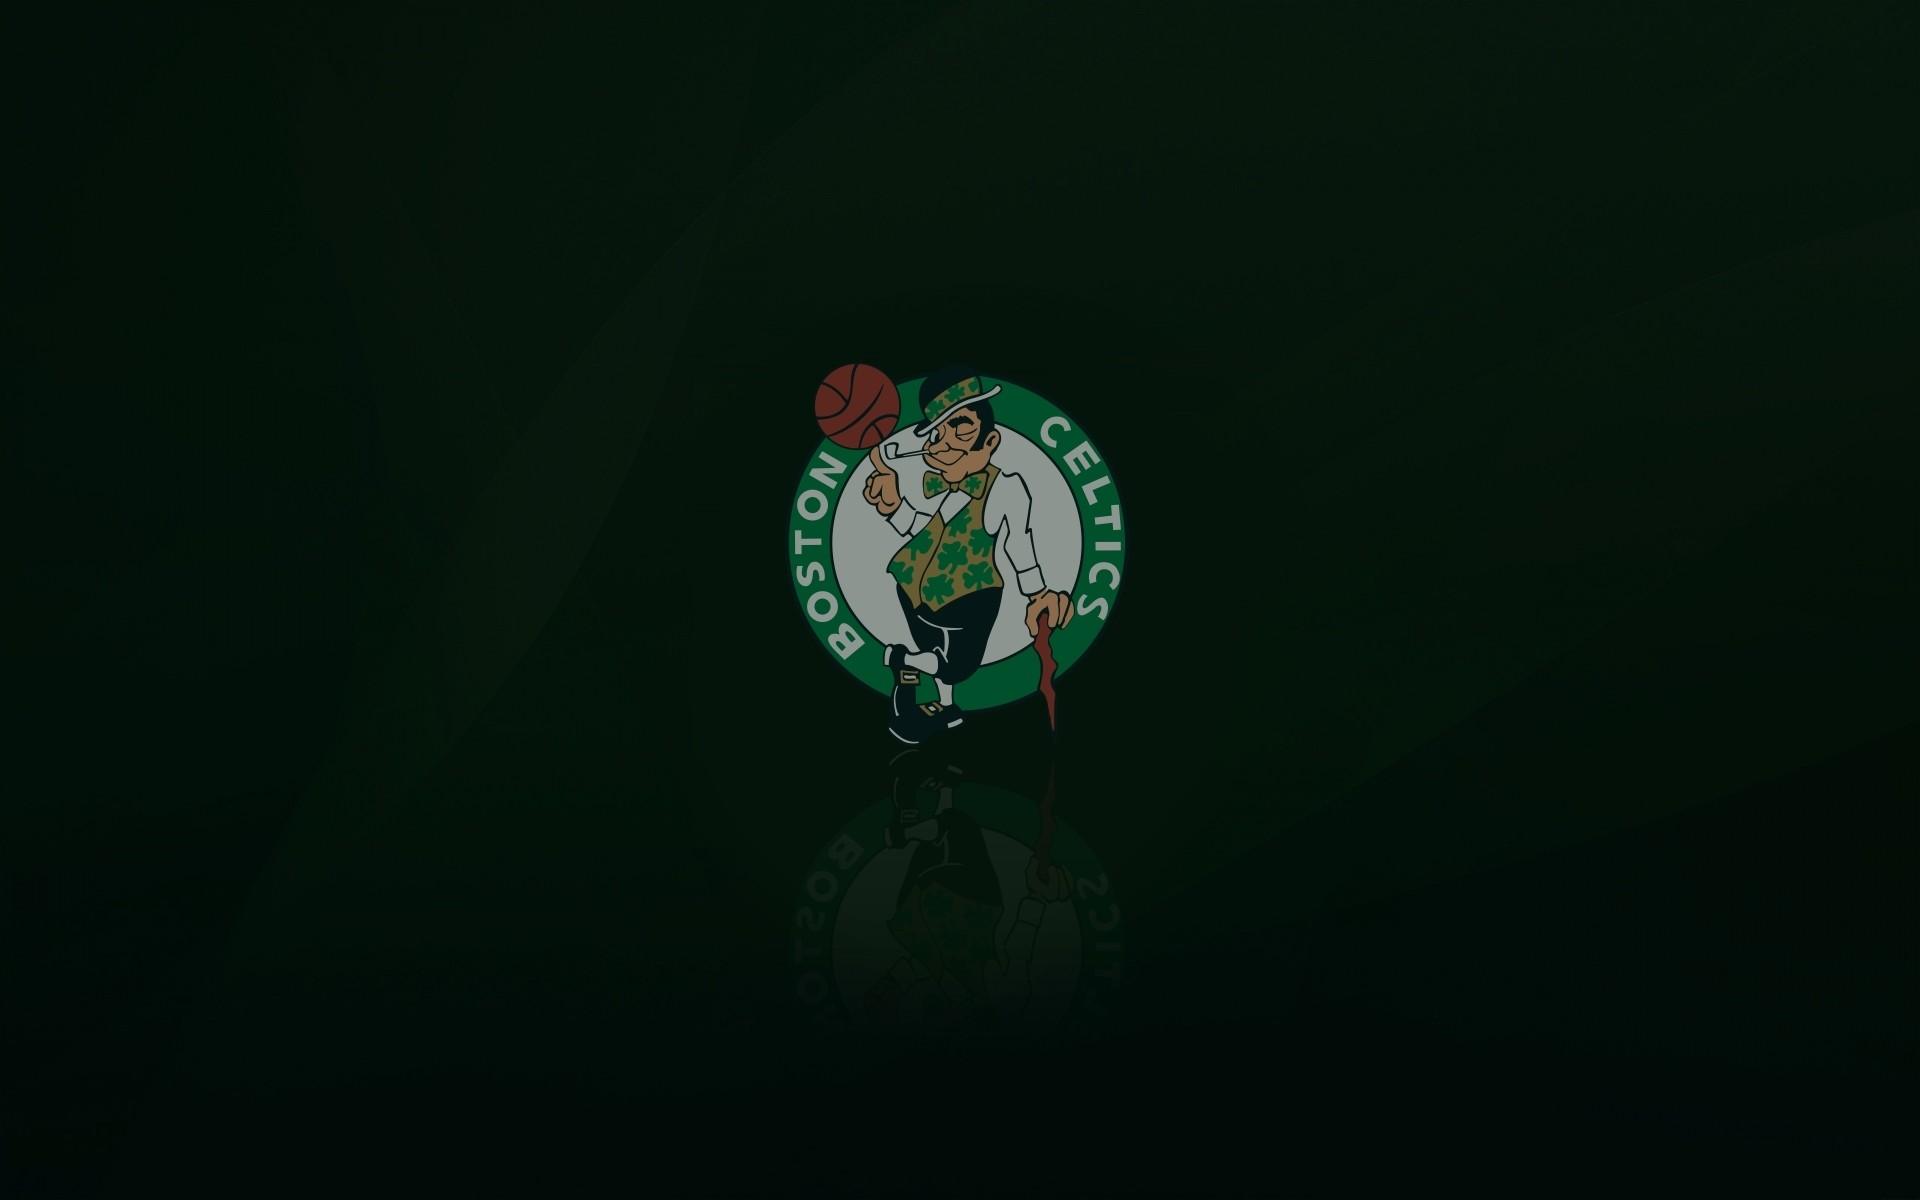 Boston celtic logo pictures